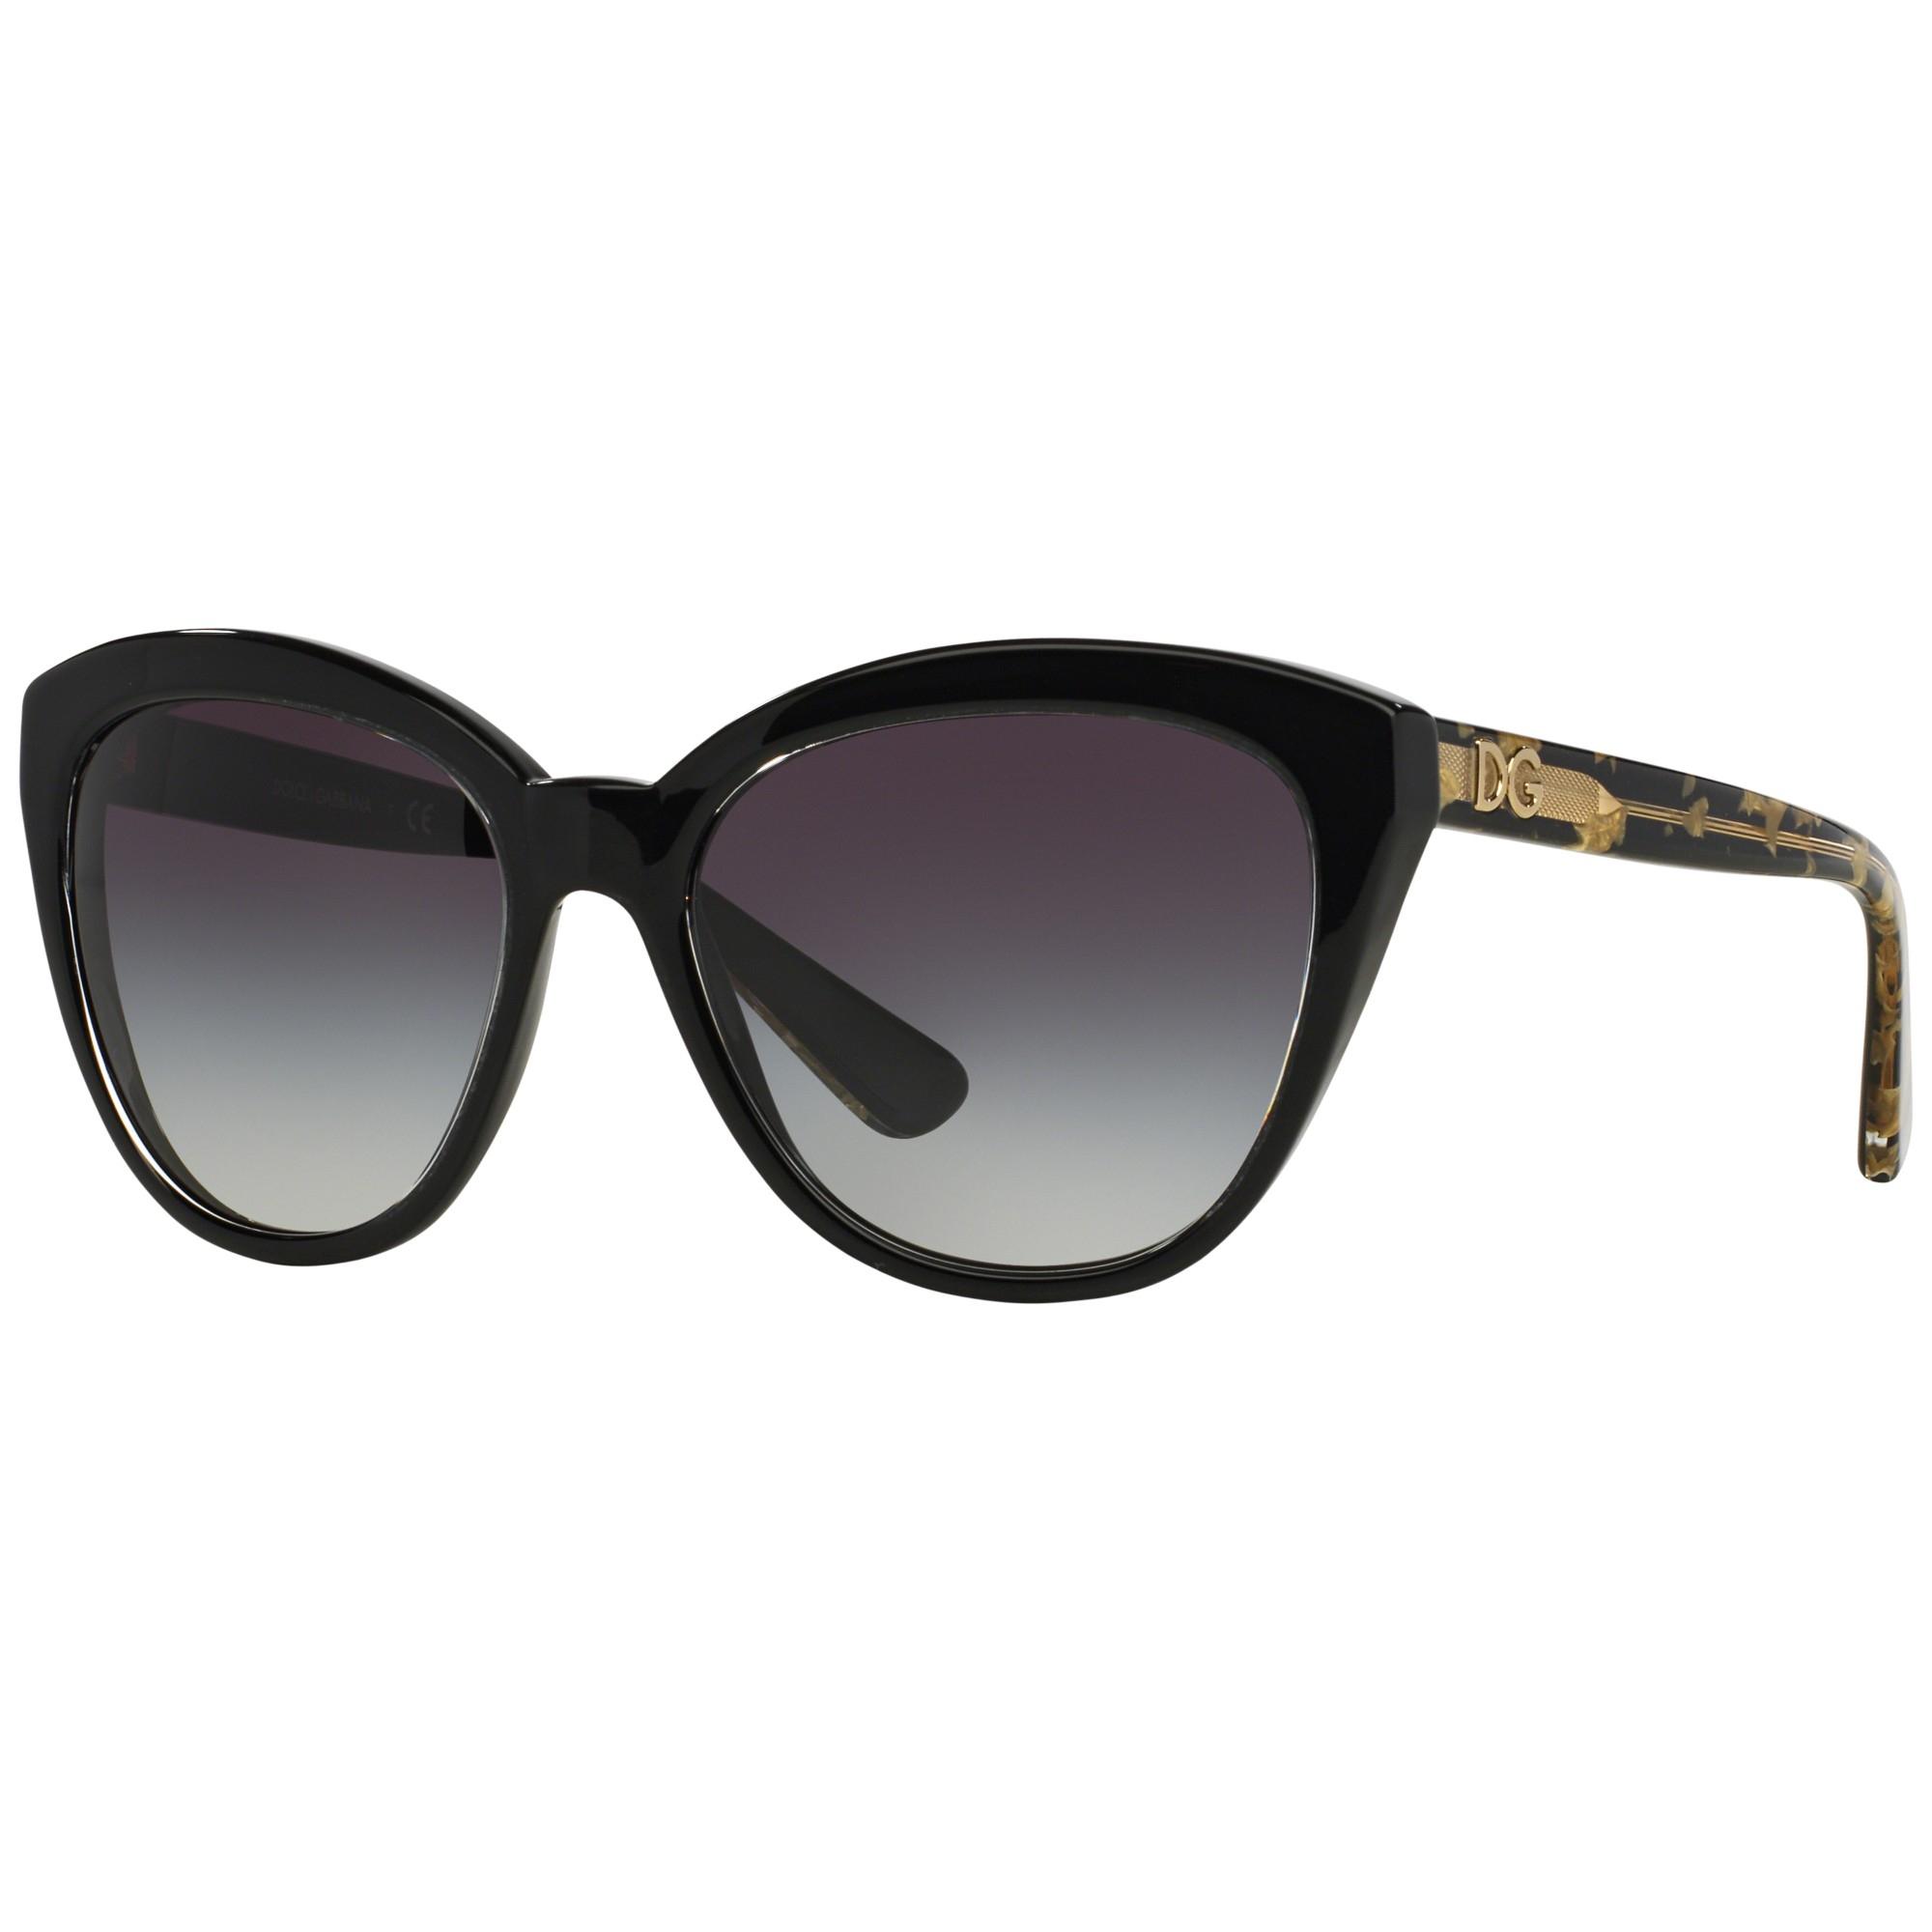 4f56f375ba2a Dolce   Gabbana Dg4250 Cat s Eye Polarised Sunglasses in Black - Lyst